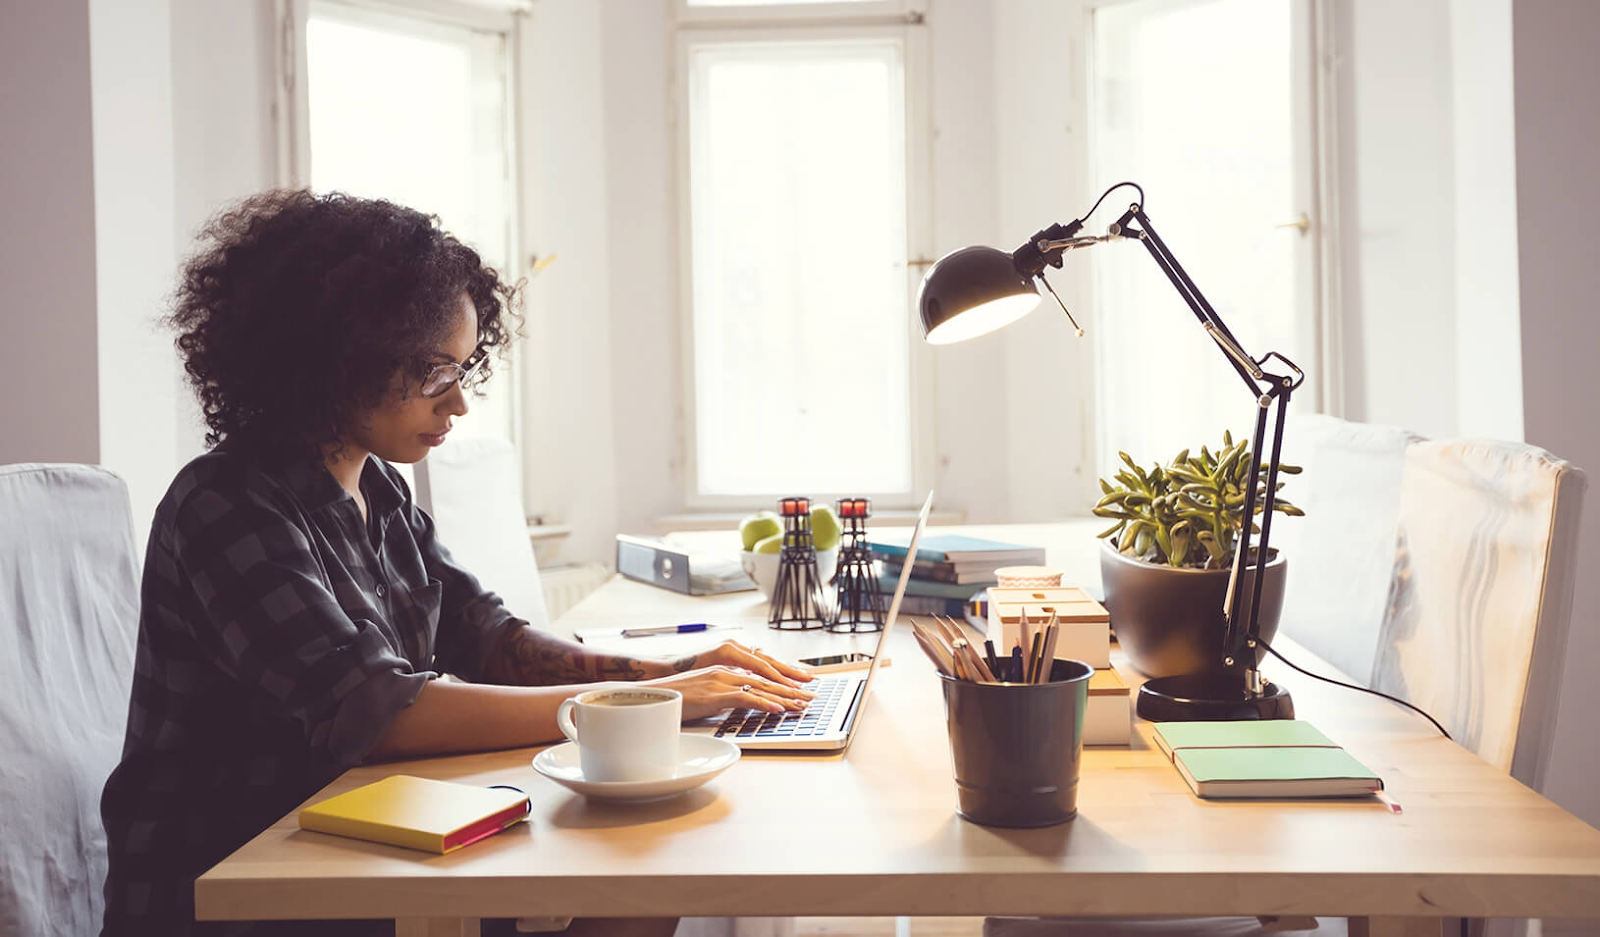 Money saving tips for university students - student managing finances and bills online